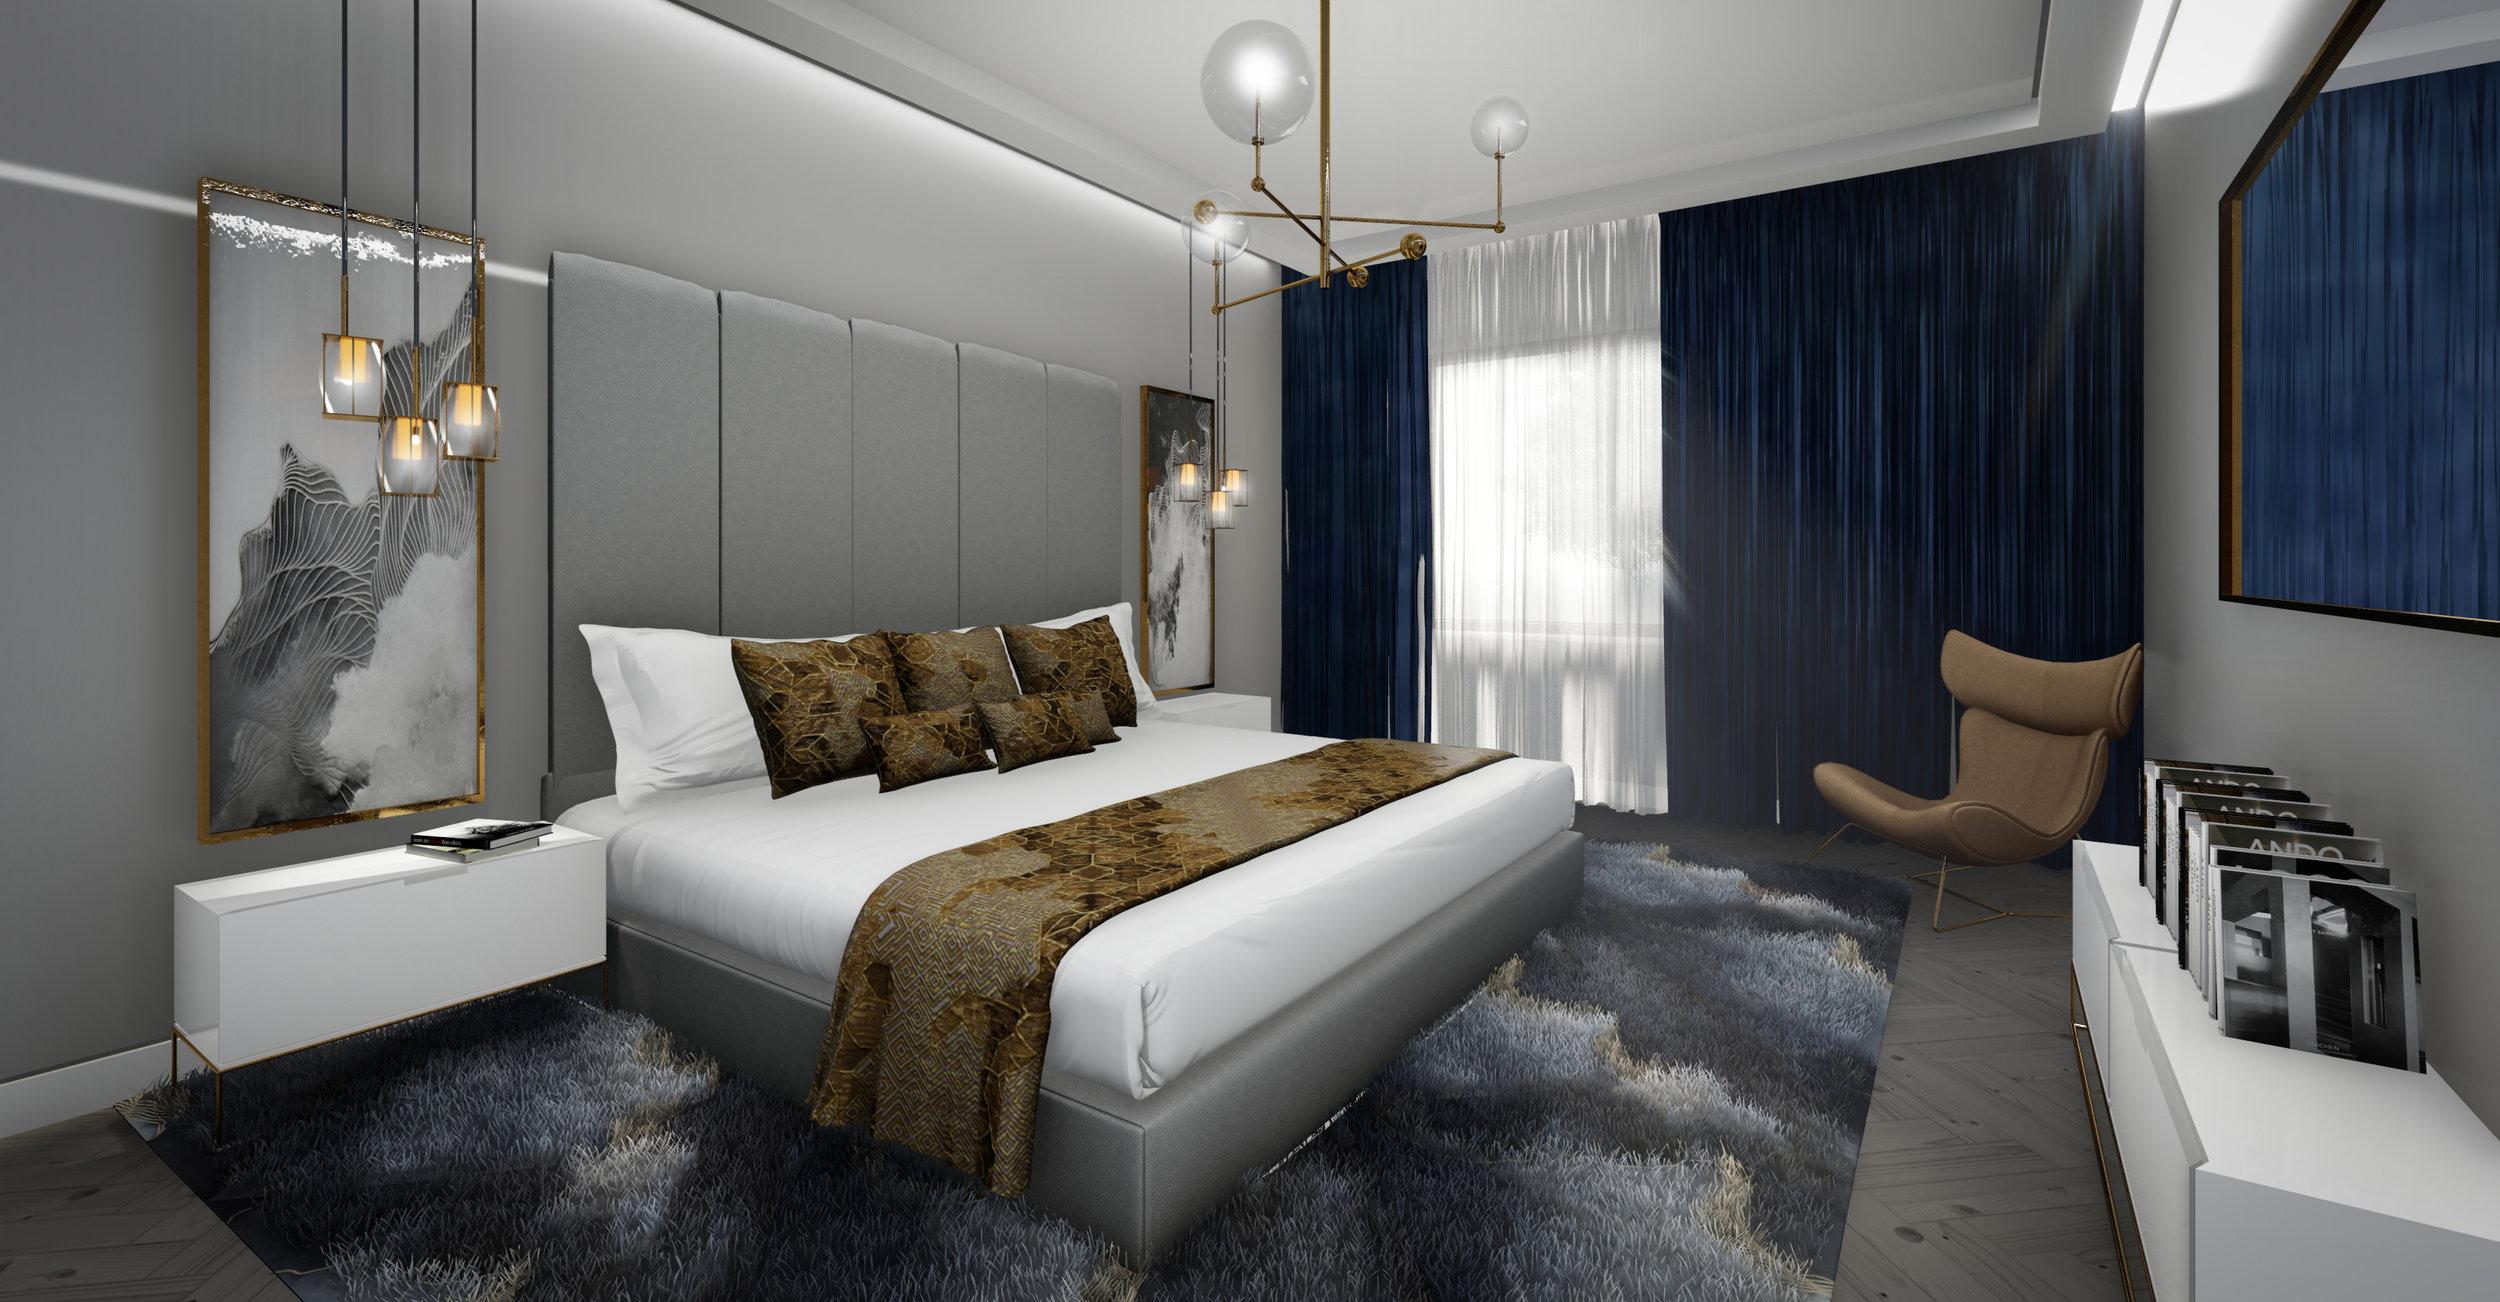 © Copyright Studio DS 2018 - the Multi Home Smart Home Interior Design 2